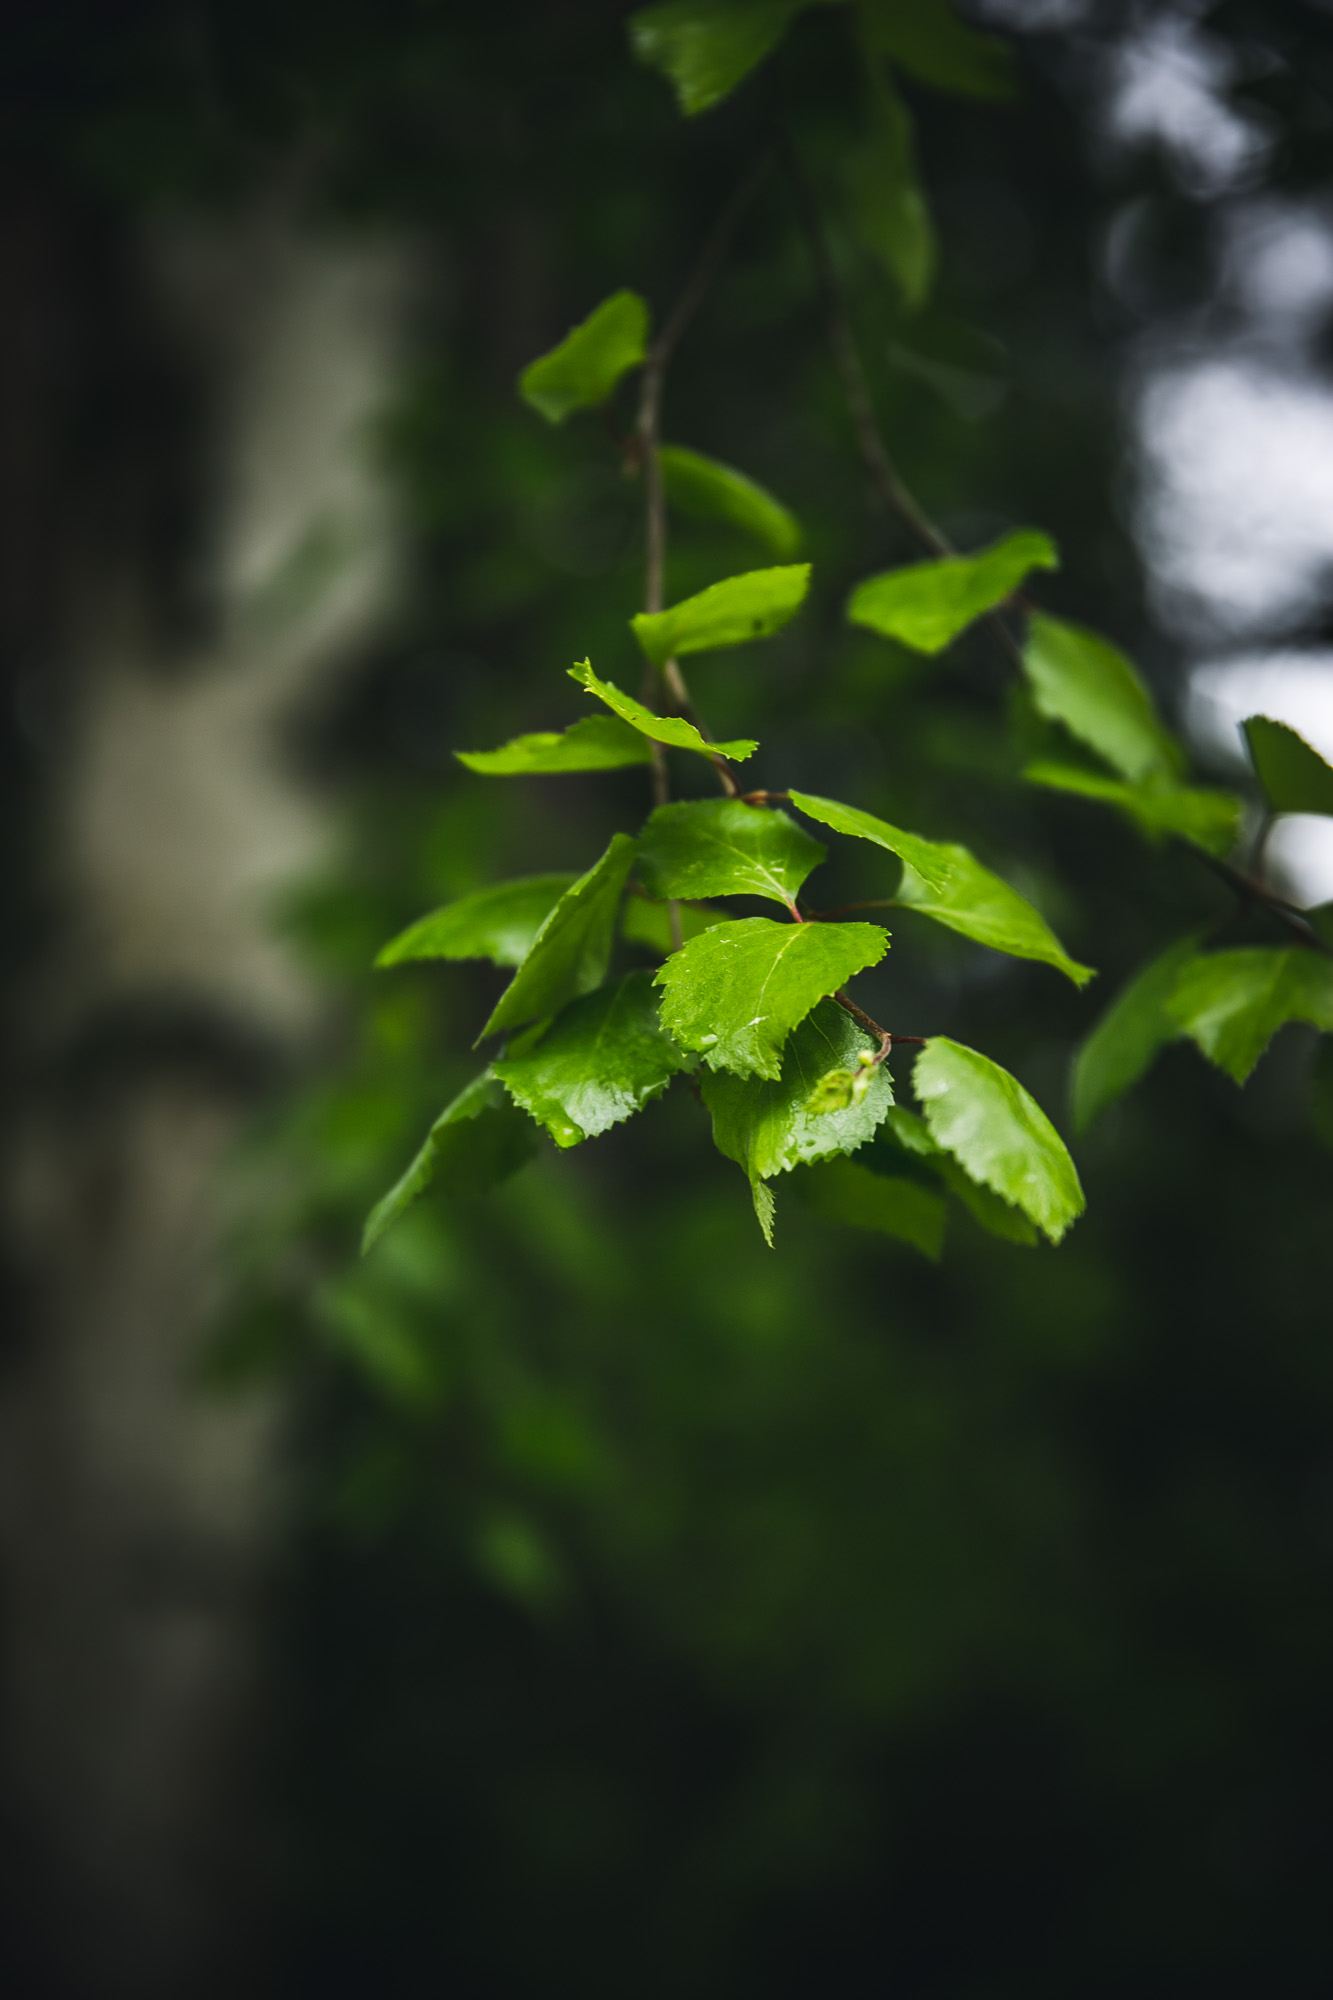 Nordic Foraging: Birch Leaves | The Adagio Blog